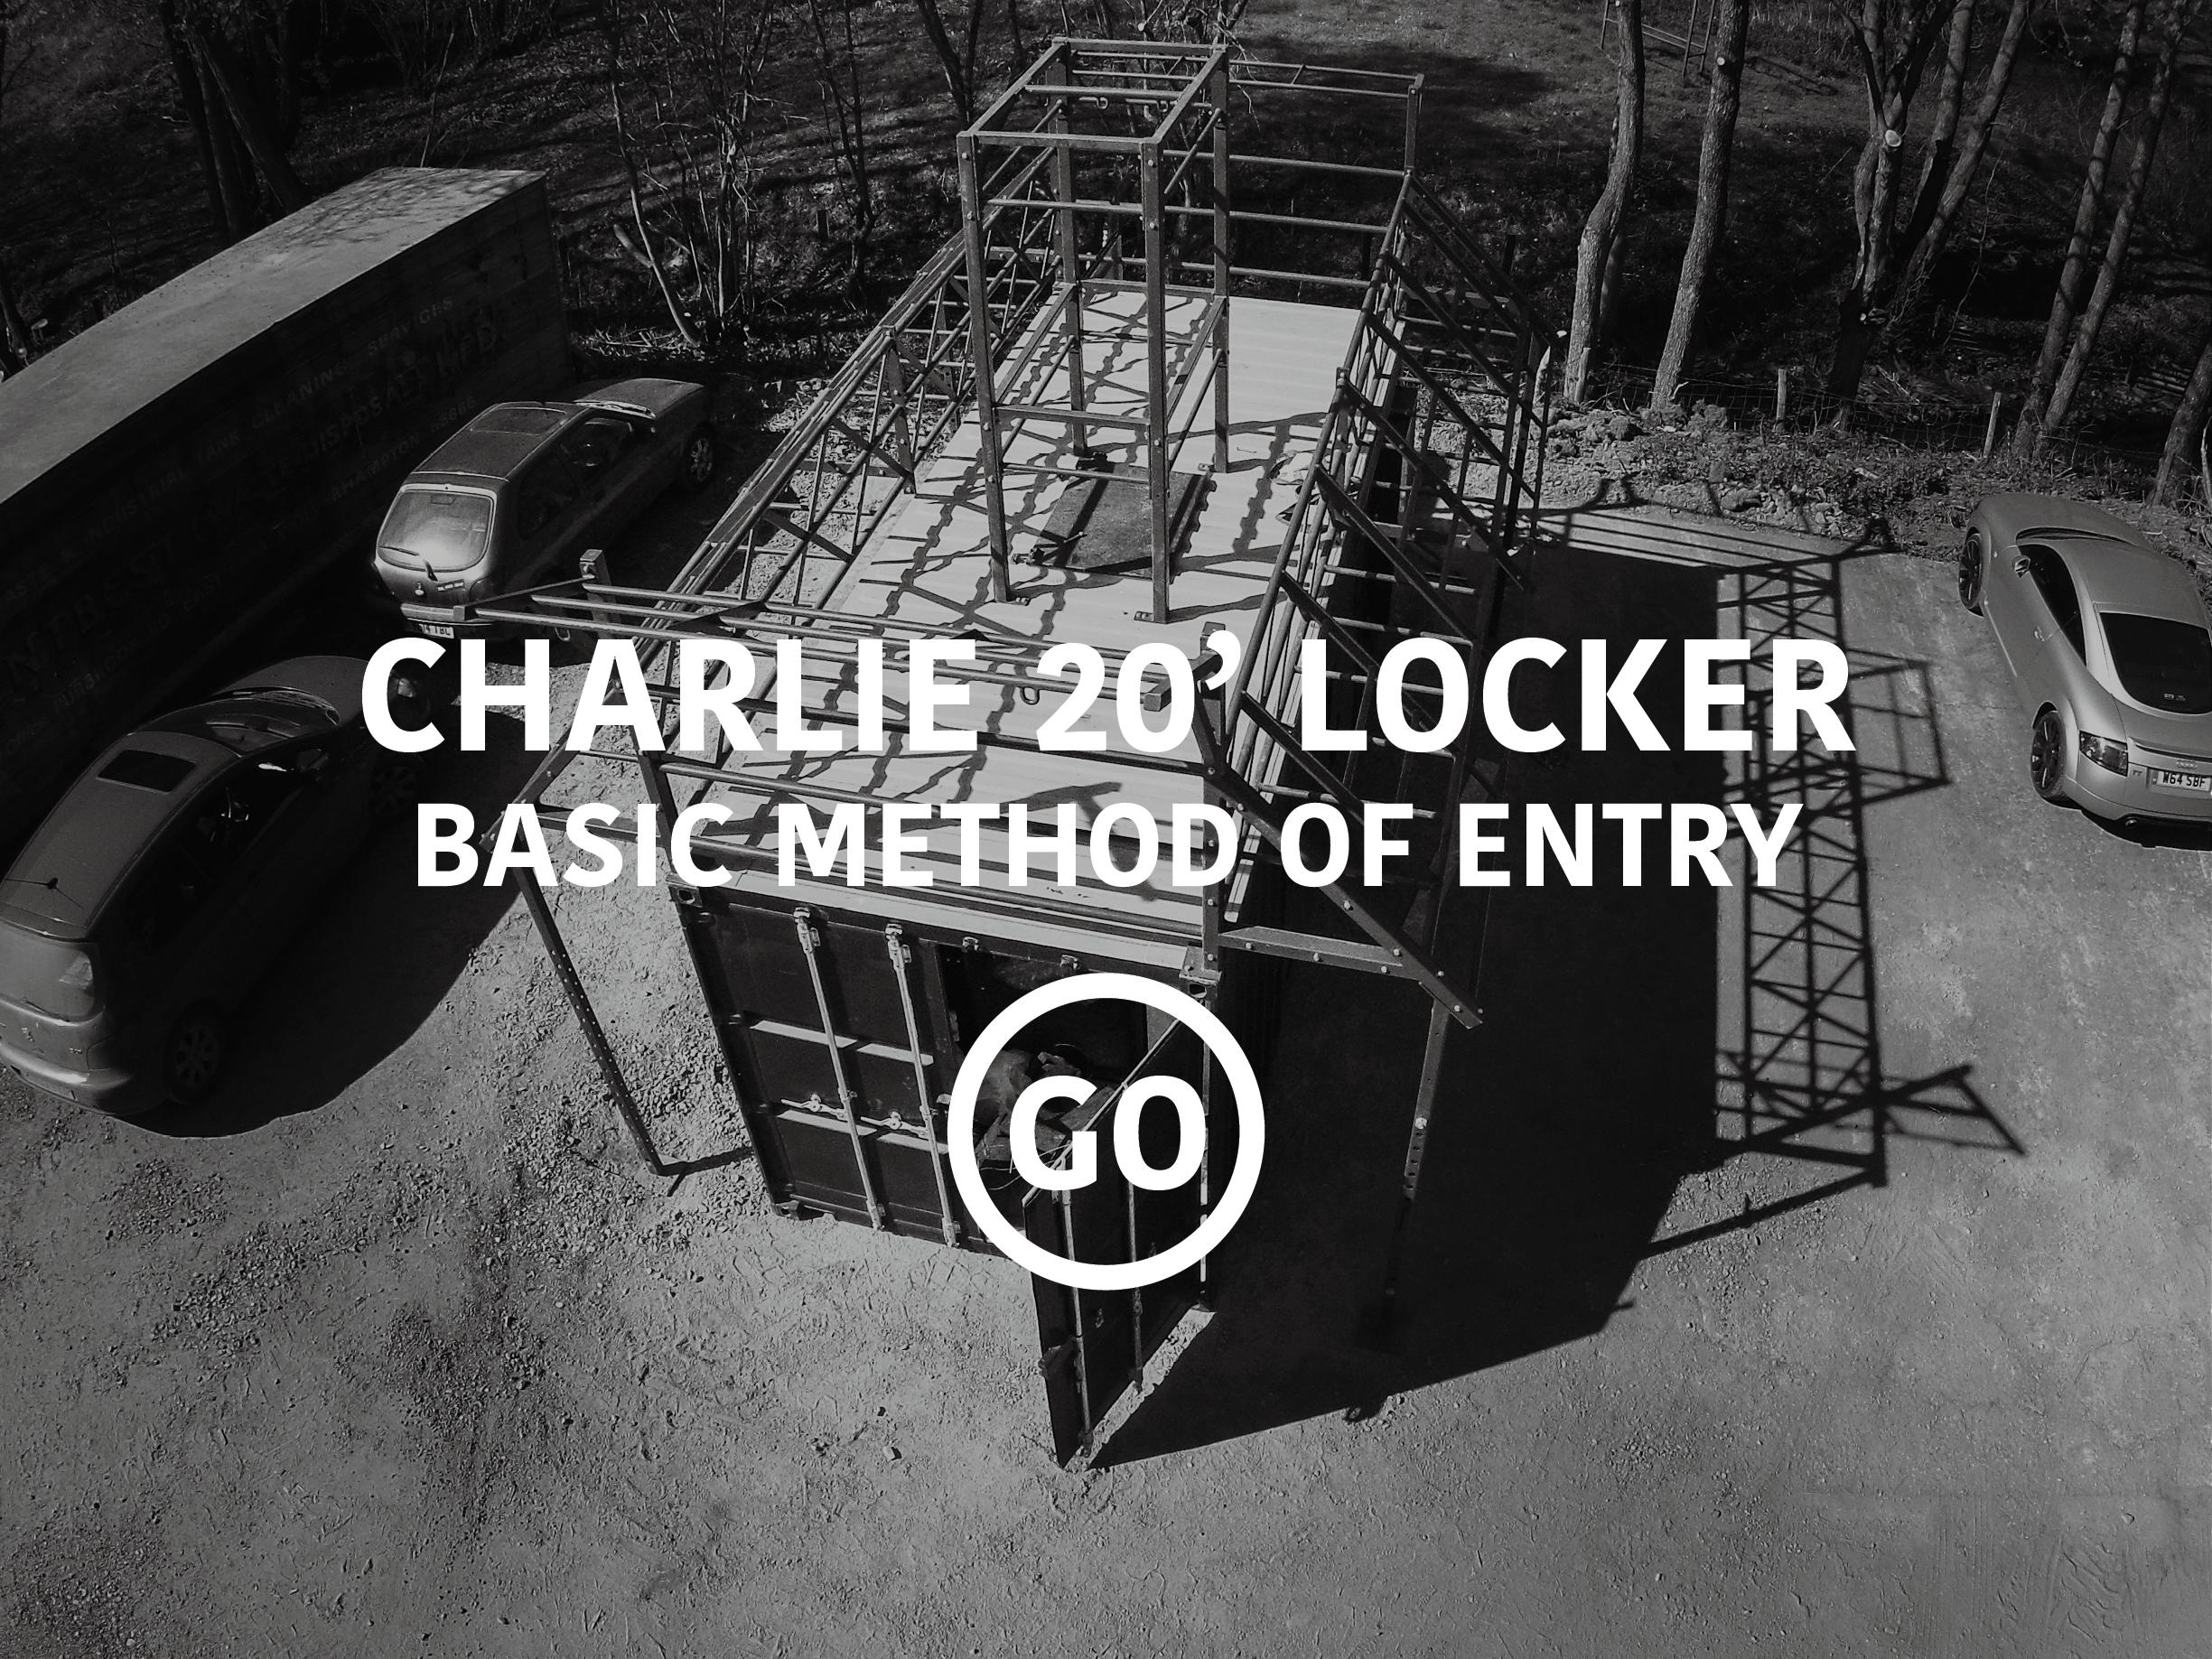 Charlie 20' Locker Basic Breaching Small Box